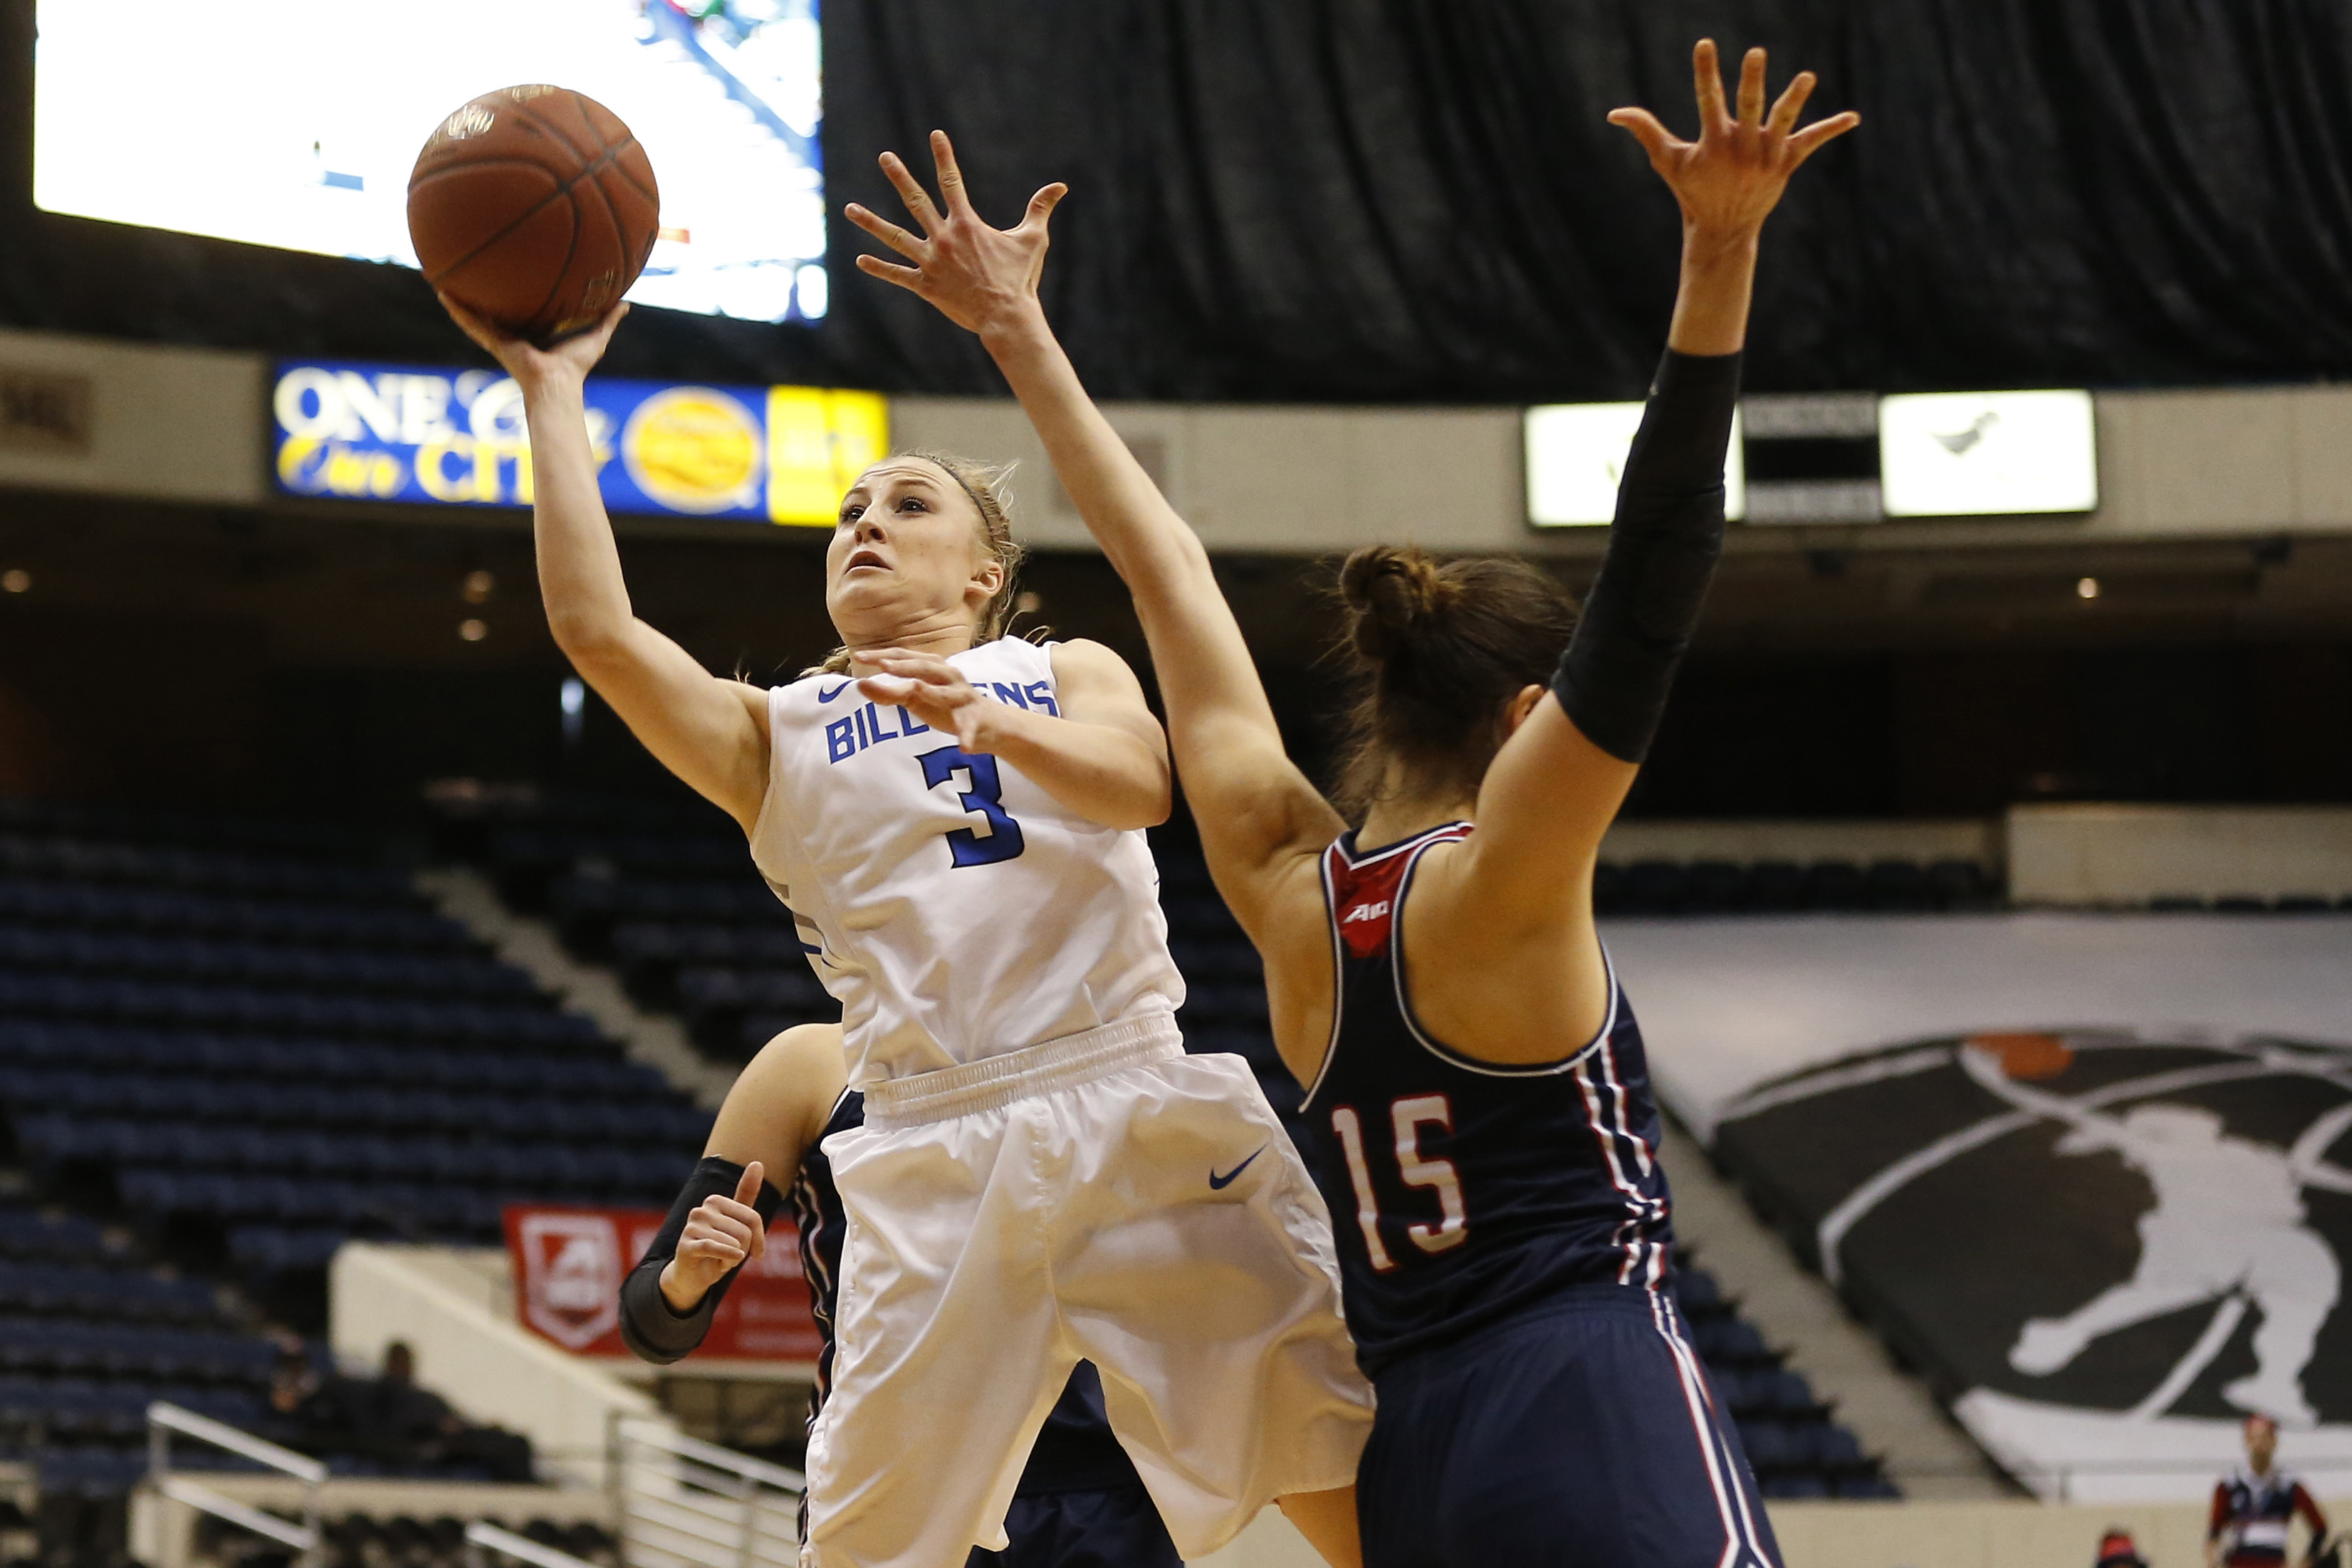 NCAA Womens Basketball: Atlantic 10 Conference Tournament-Duquesne vs Saint Louis